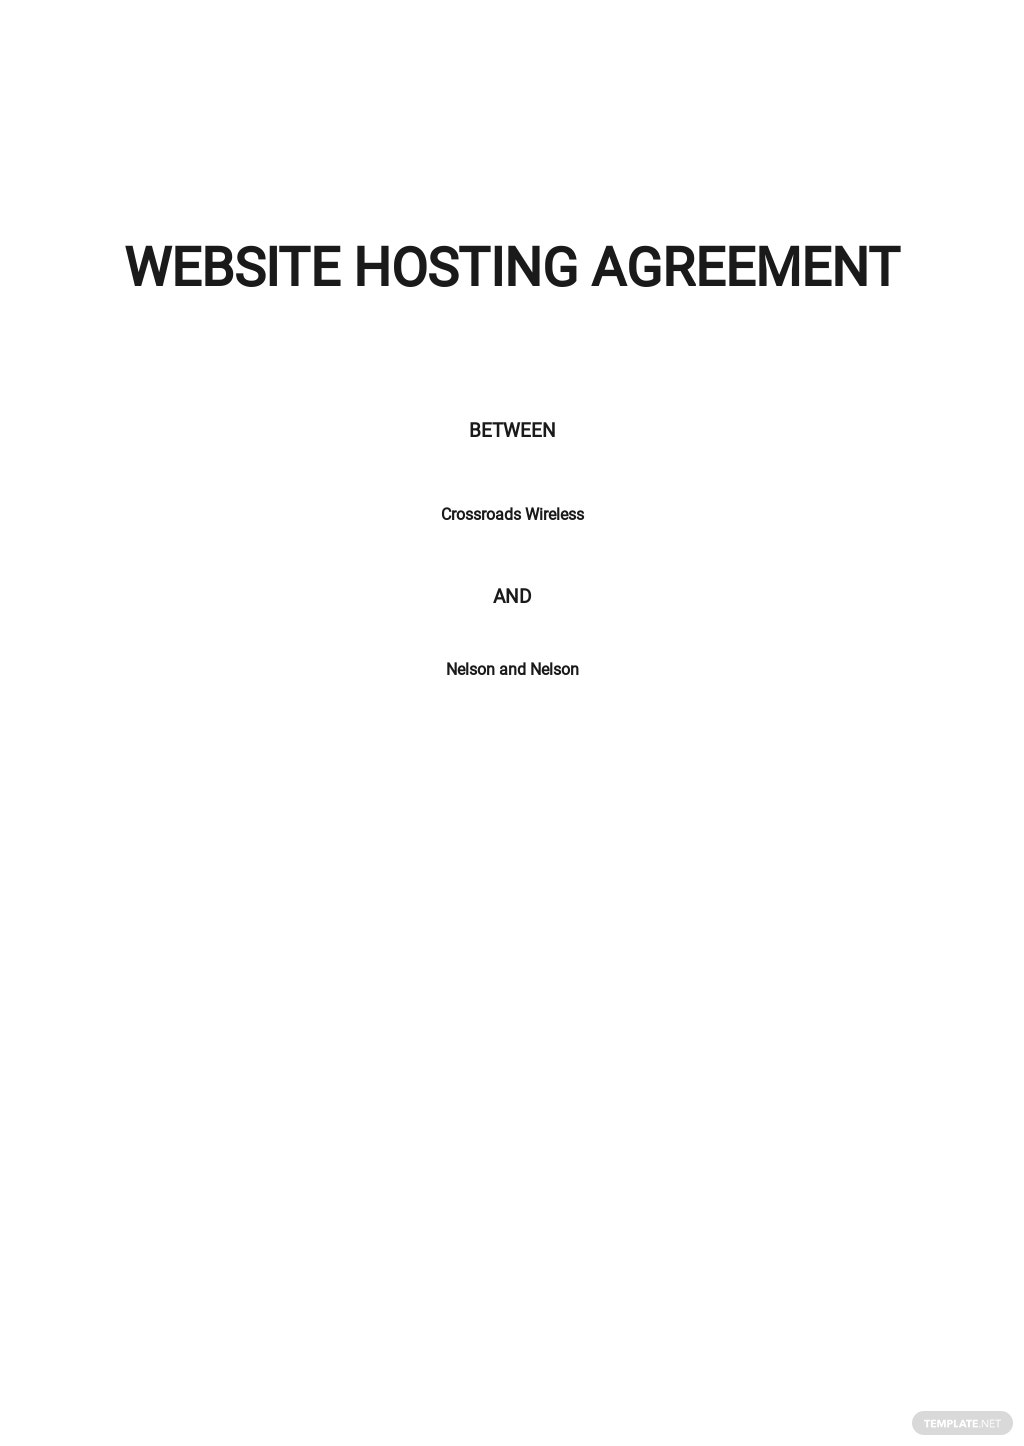 Website Hosting Agreement Template